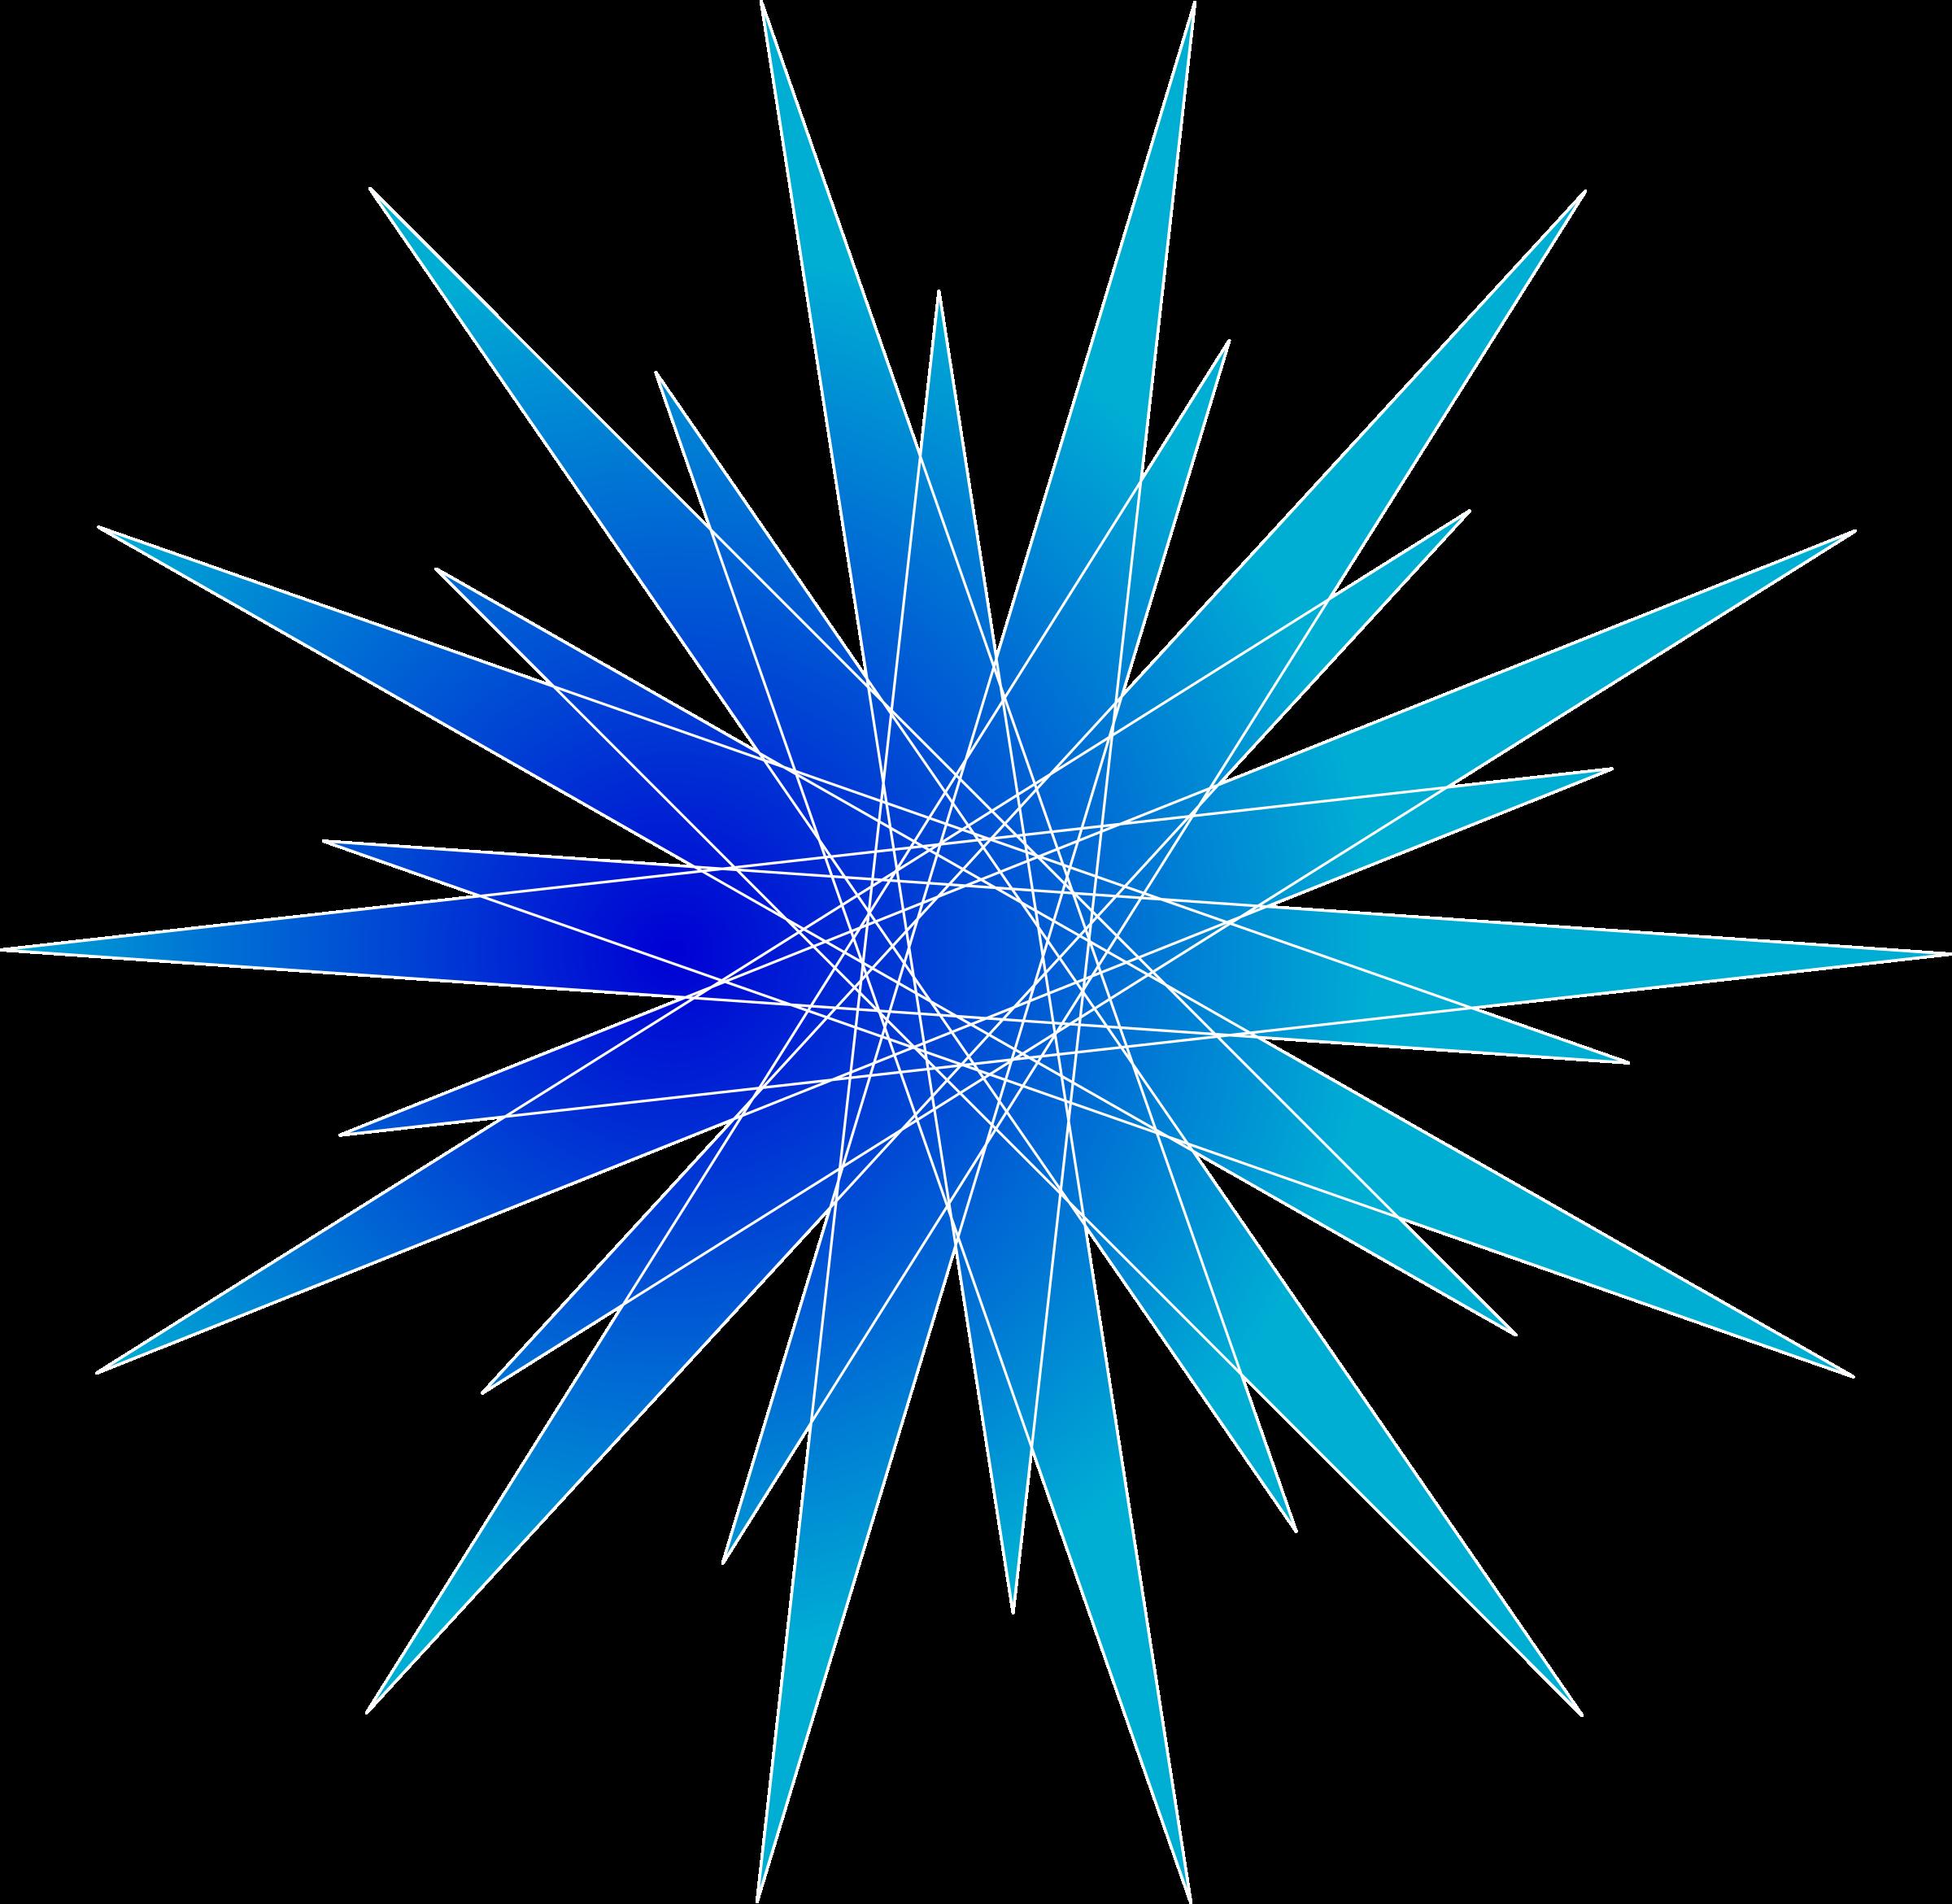 Dark Blue clipart star Clip Blue IMGFLASH Art Star